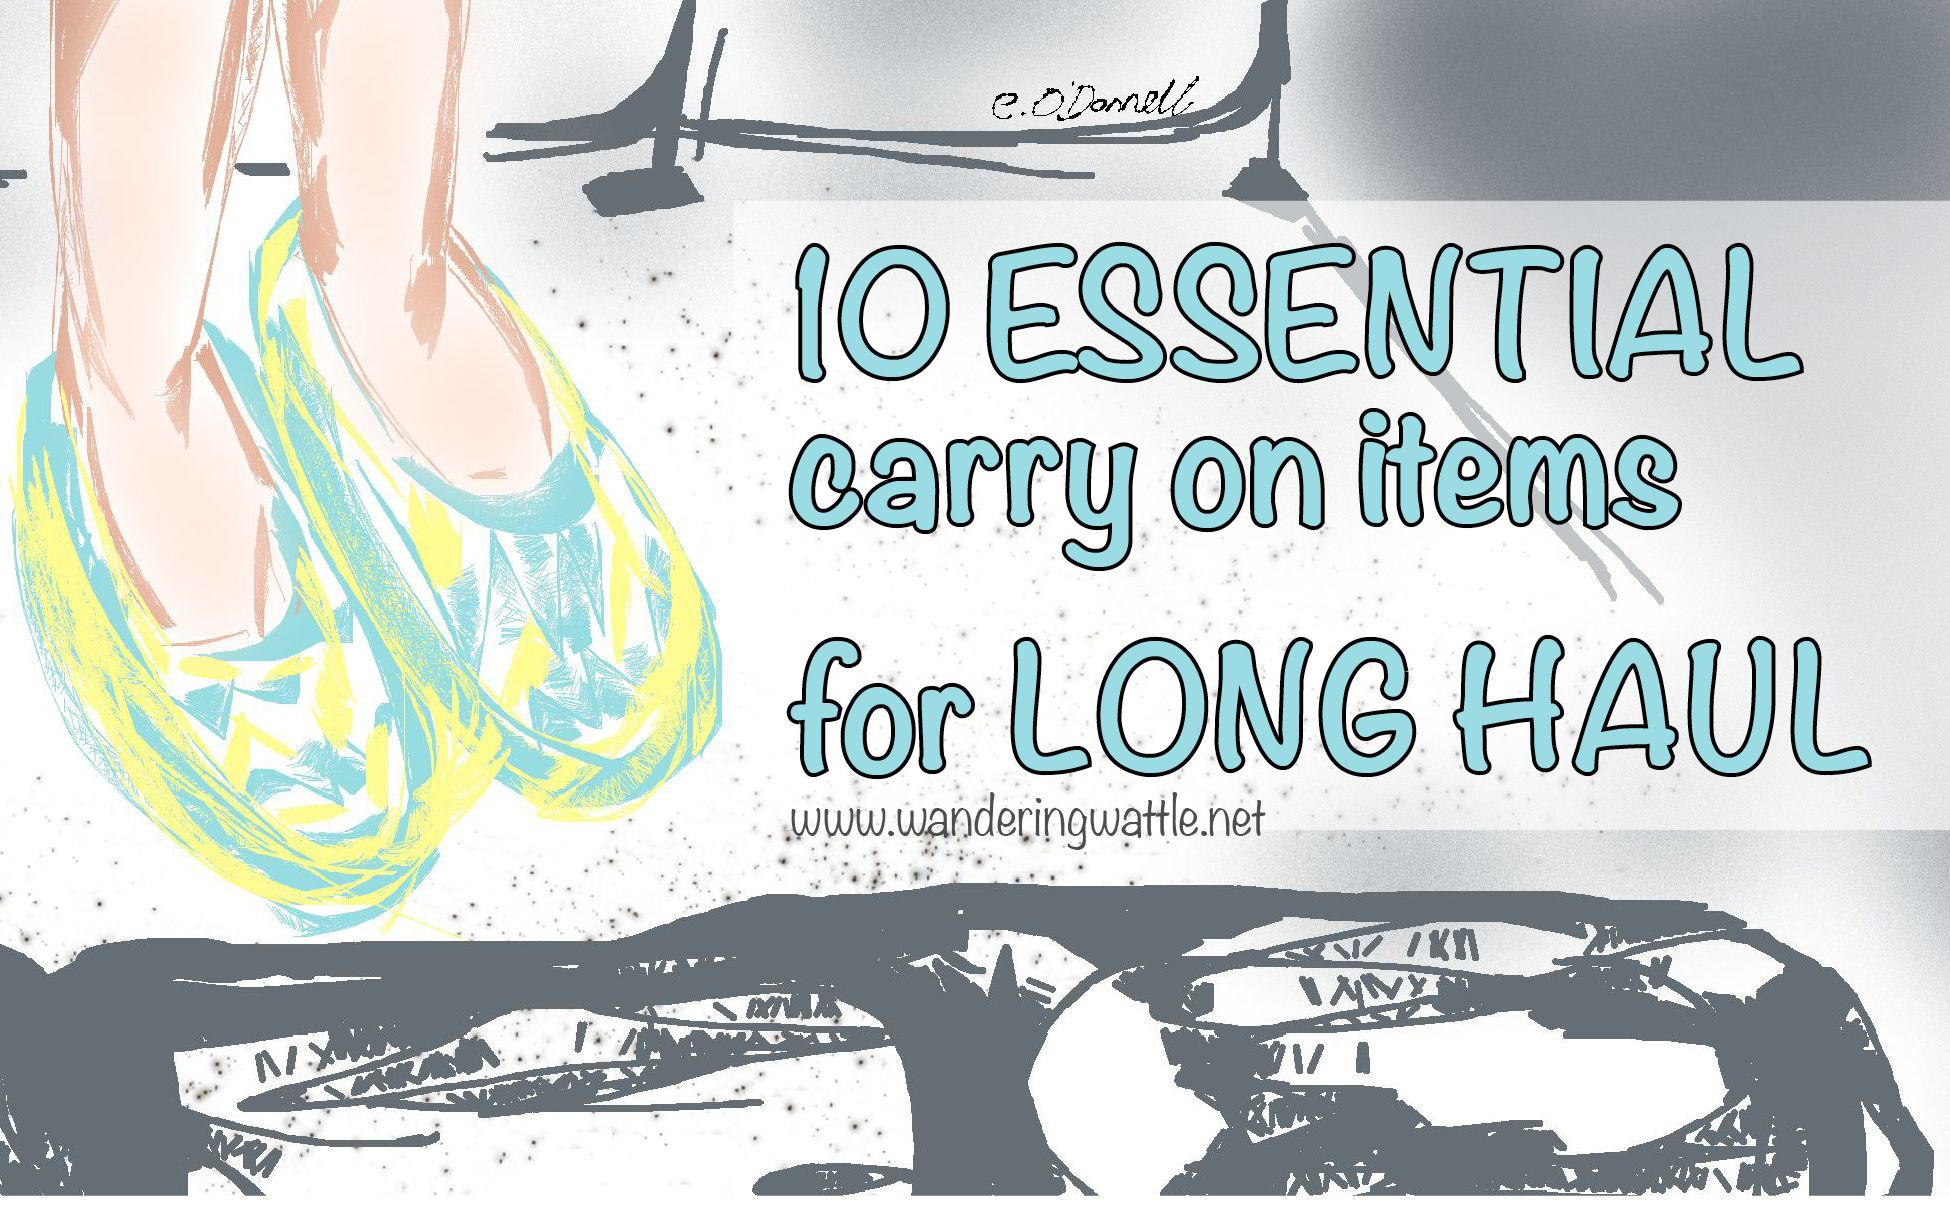 10 essential long haul carry on items Long haul, Major